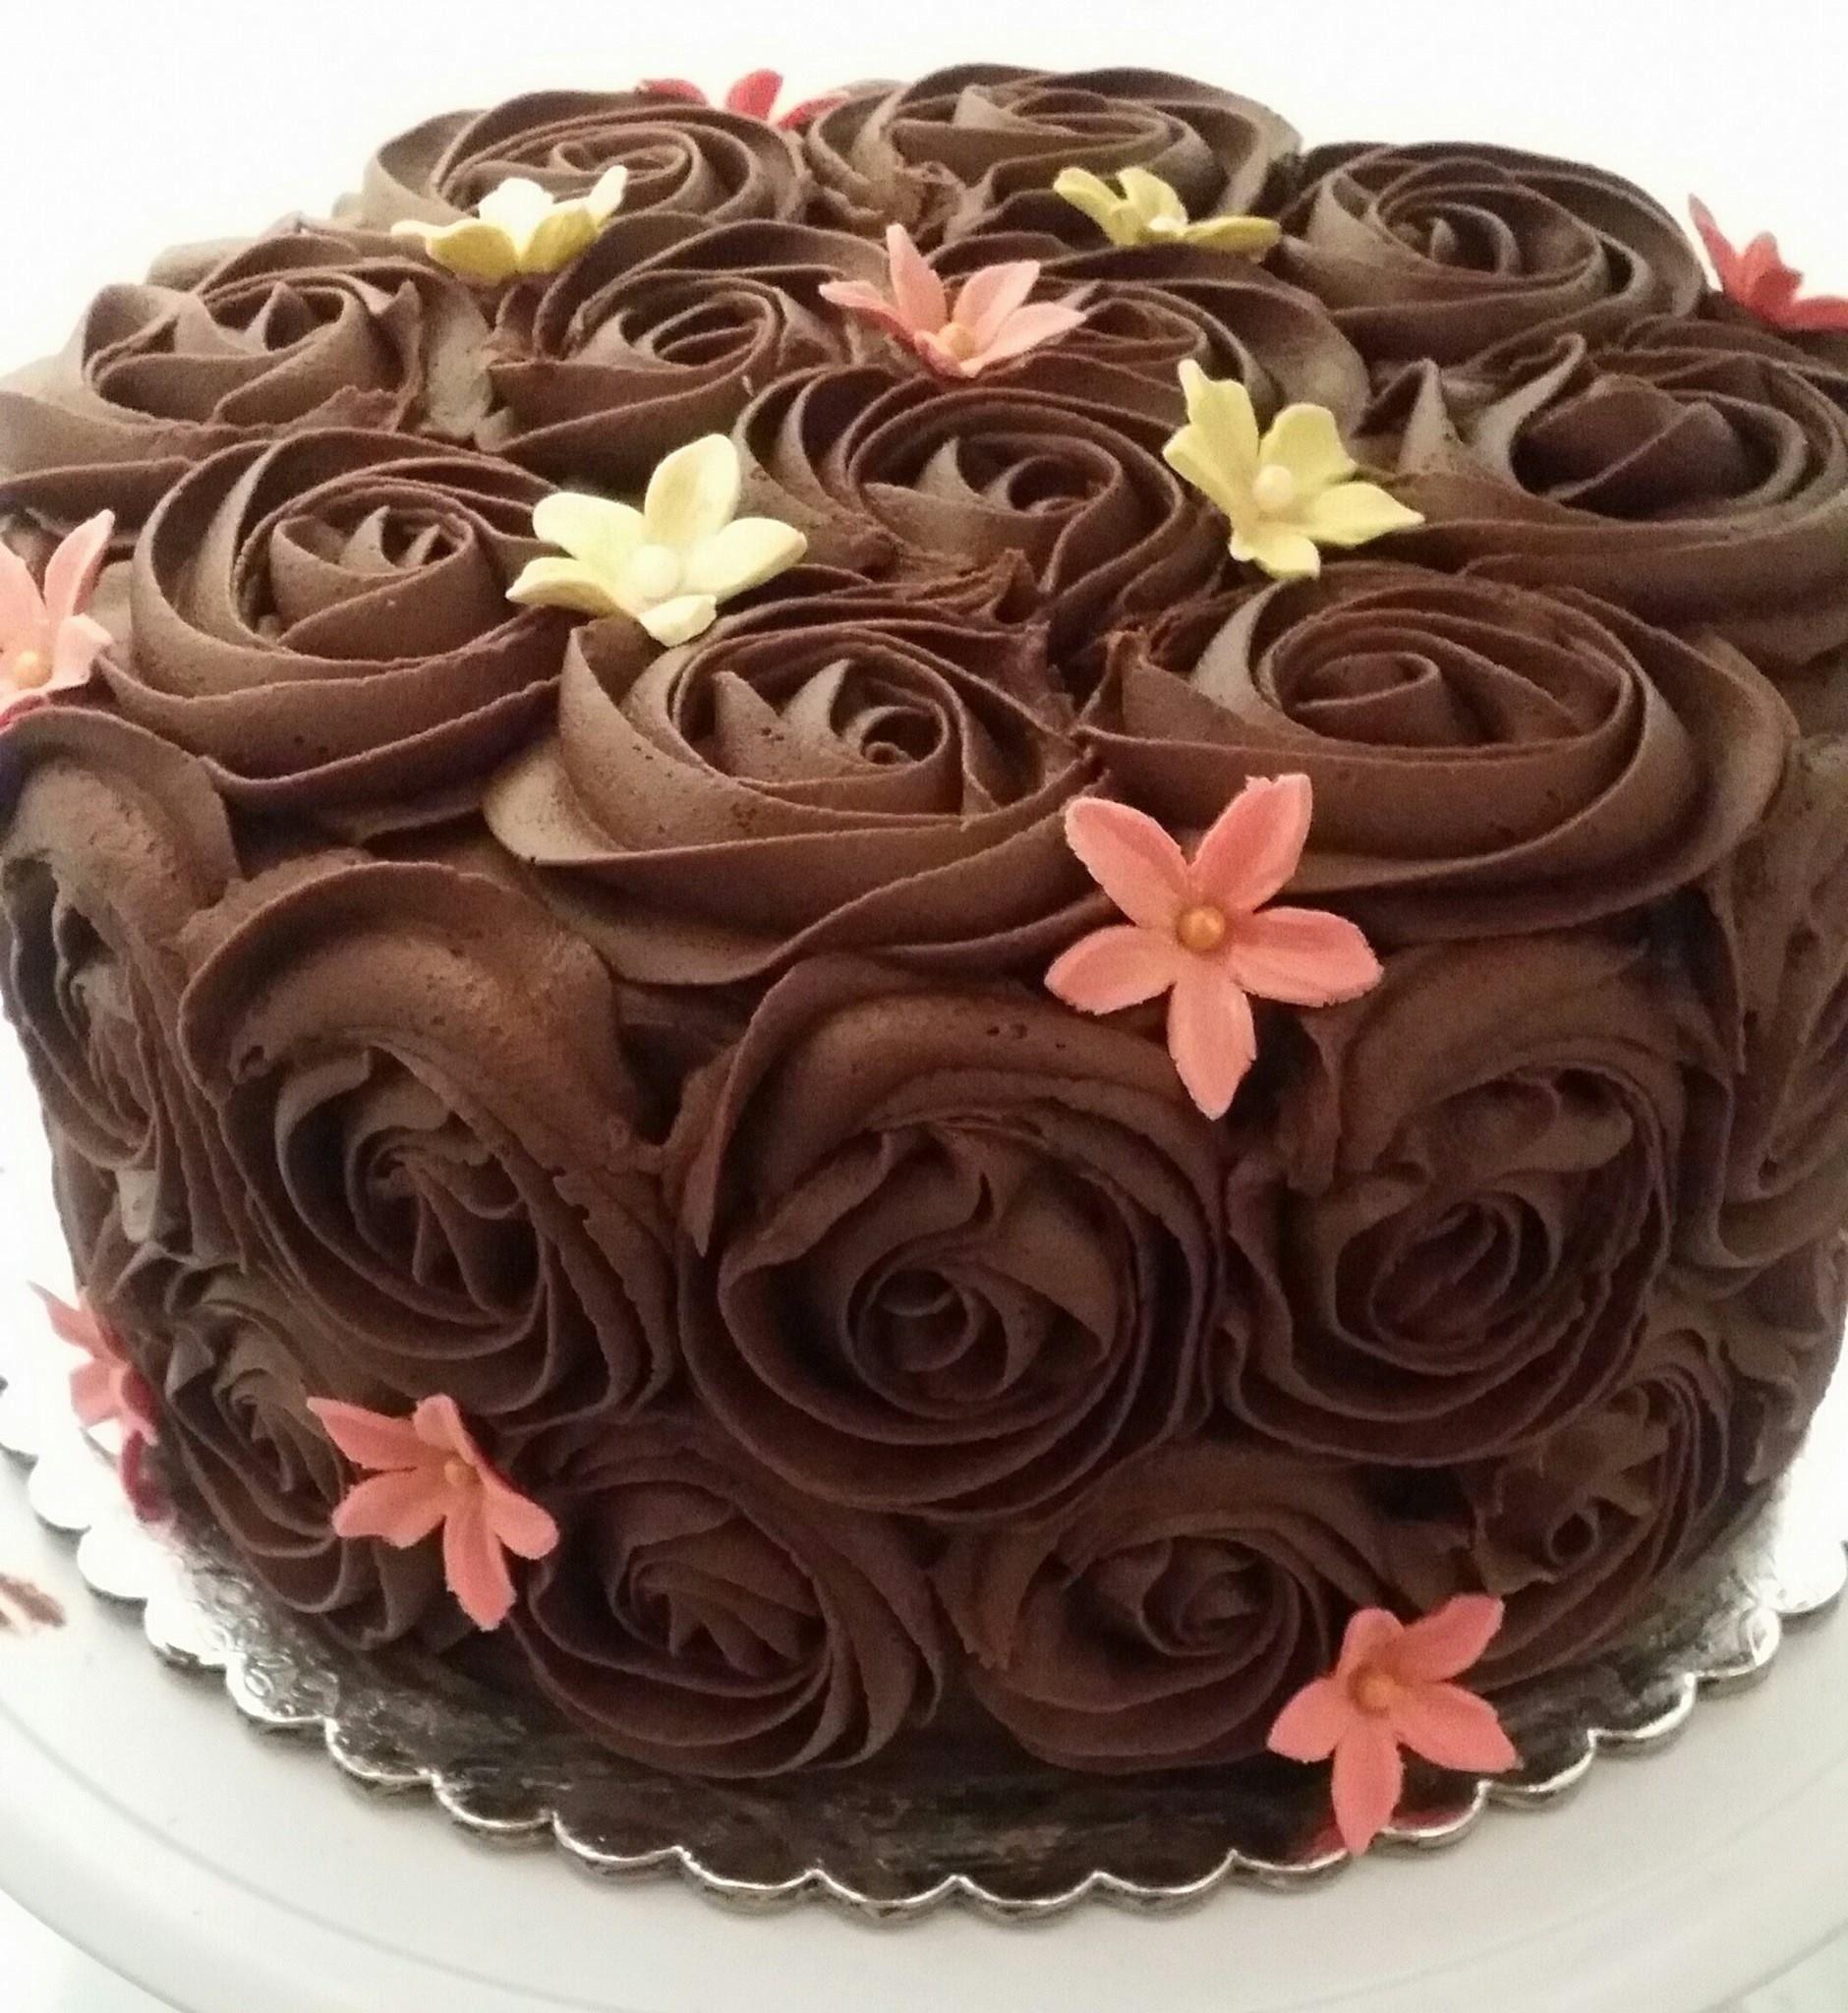 Chocolate Buttercream Rose Swirl Fondant Flower Decorations My